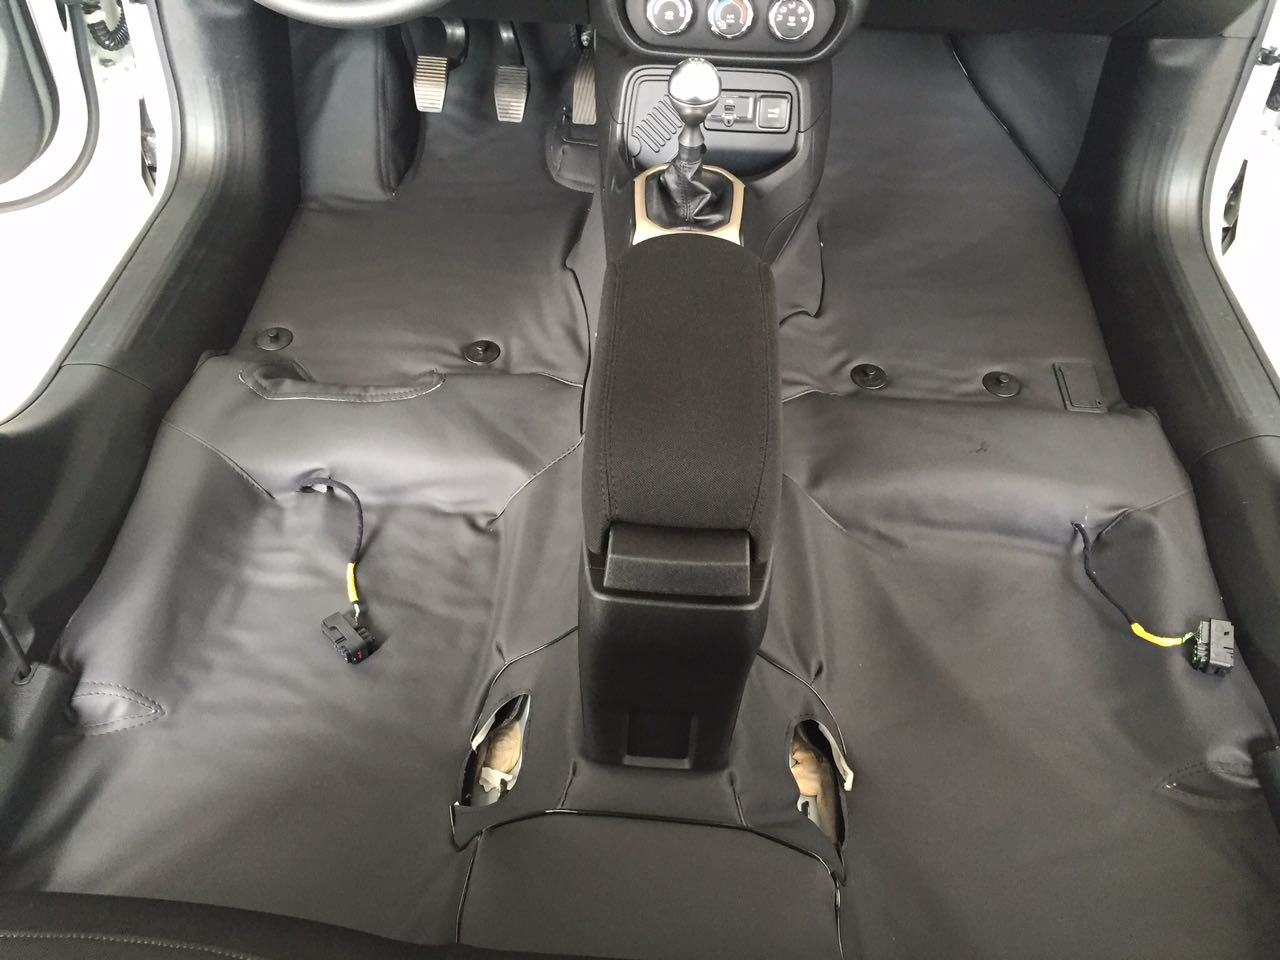 Forro Super Luxo Automotivo Assoalho Para Nissan March 2011 a 2018